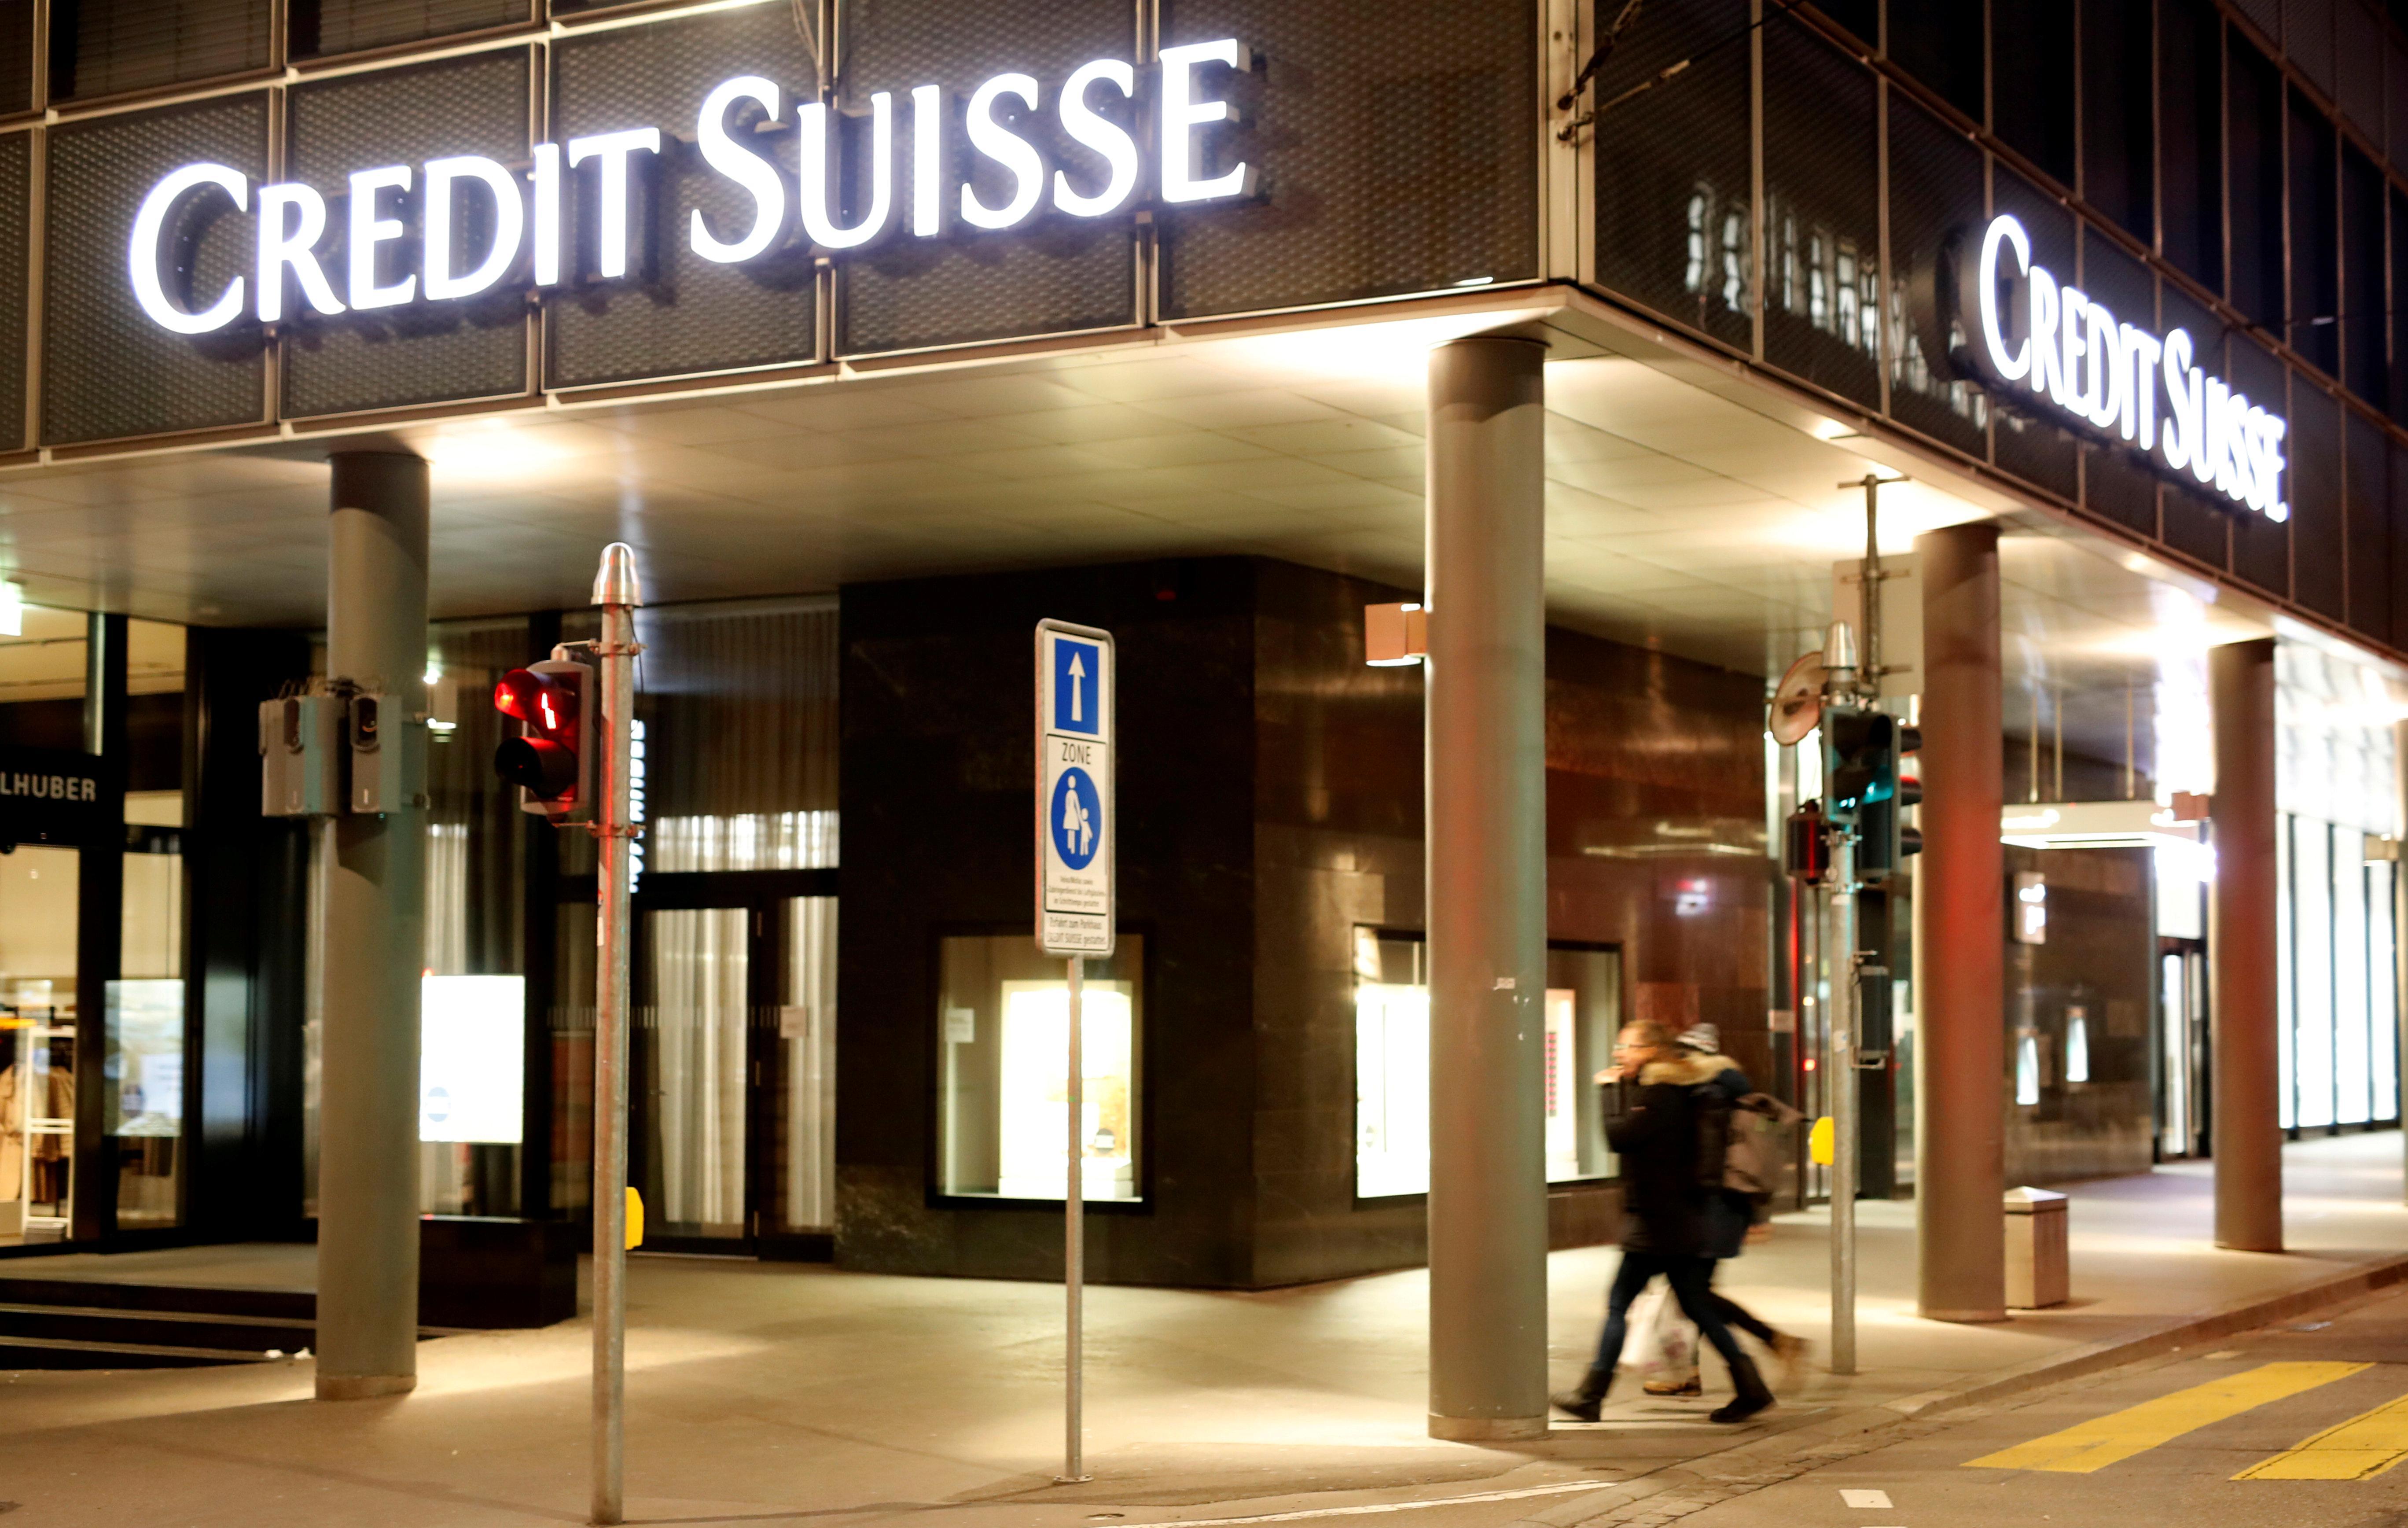 Credit Suisse targeting savings of 2% to 3% per year